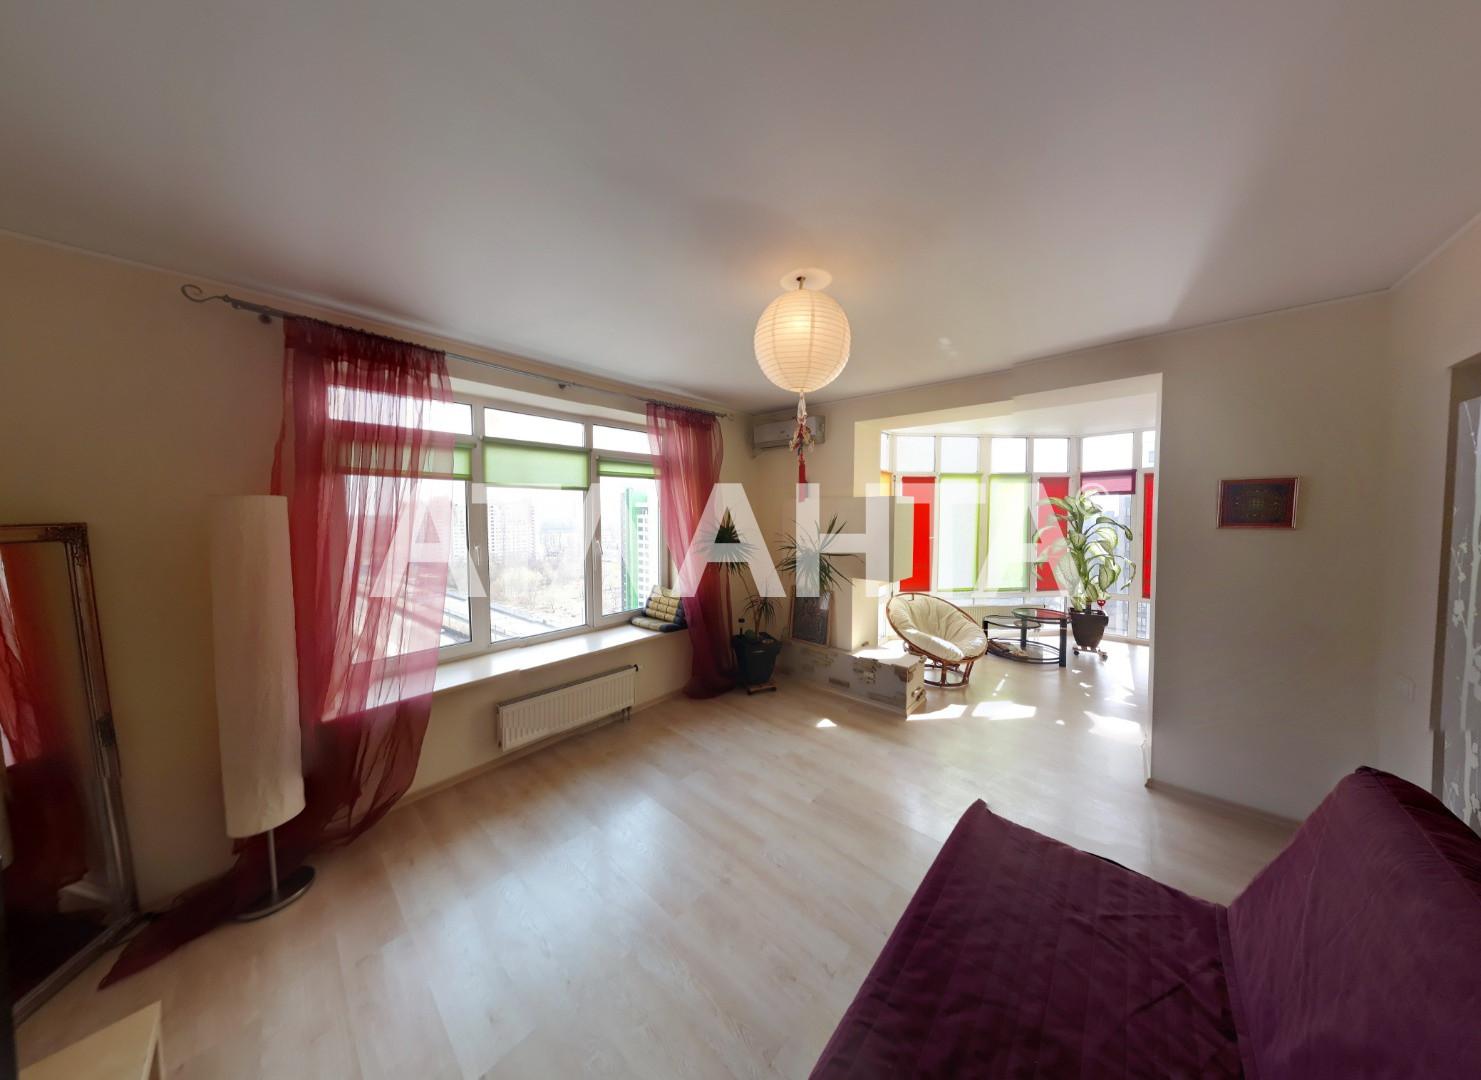 Продается 3-комнатная Квартира на ул. Ломоносова — 118 900 у.е. (фото №4)